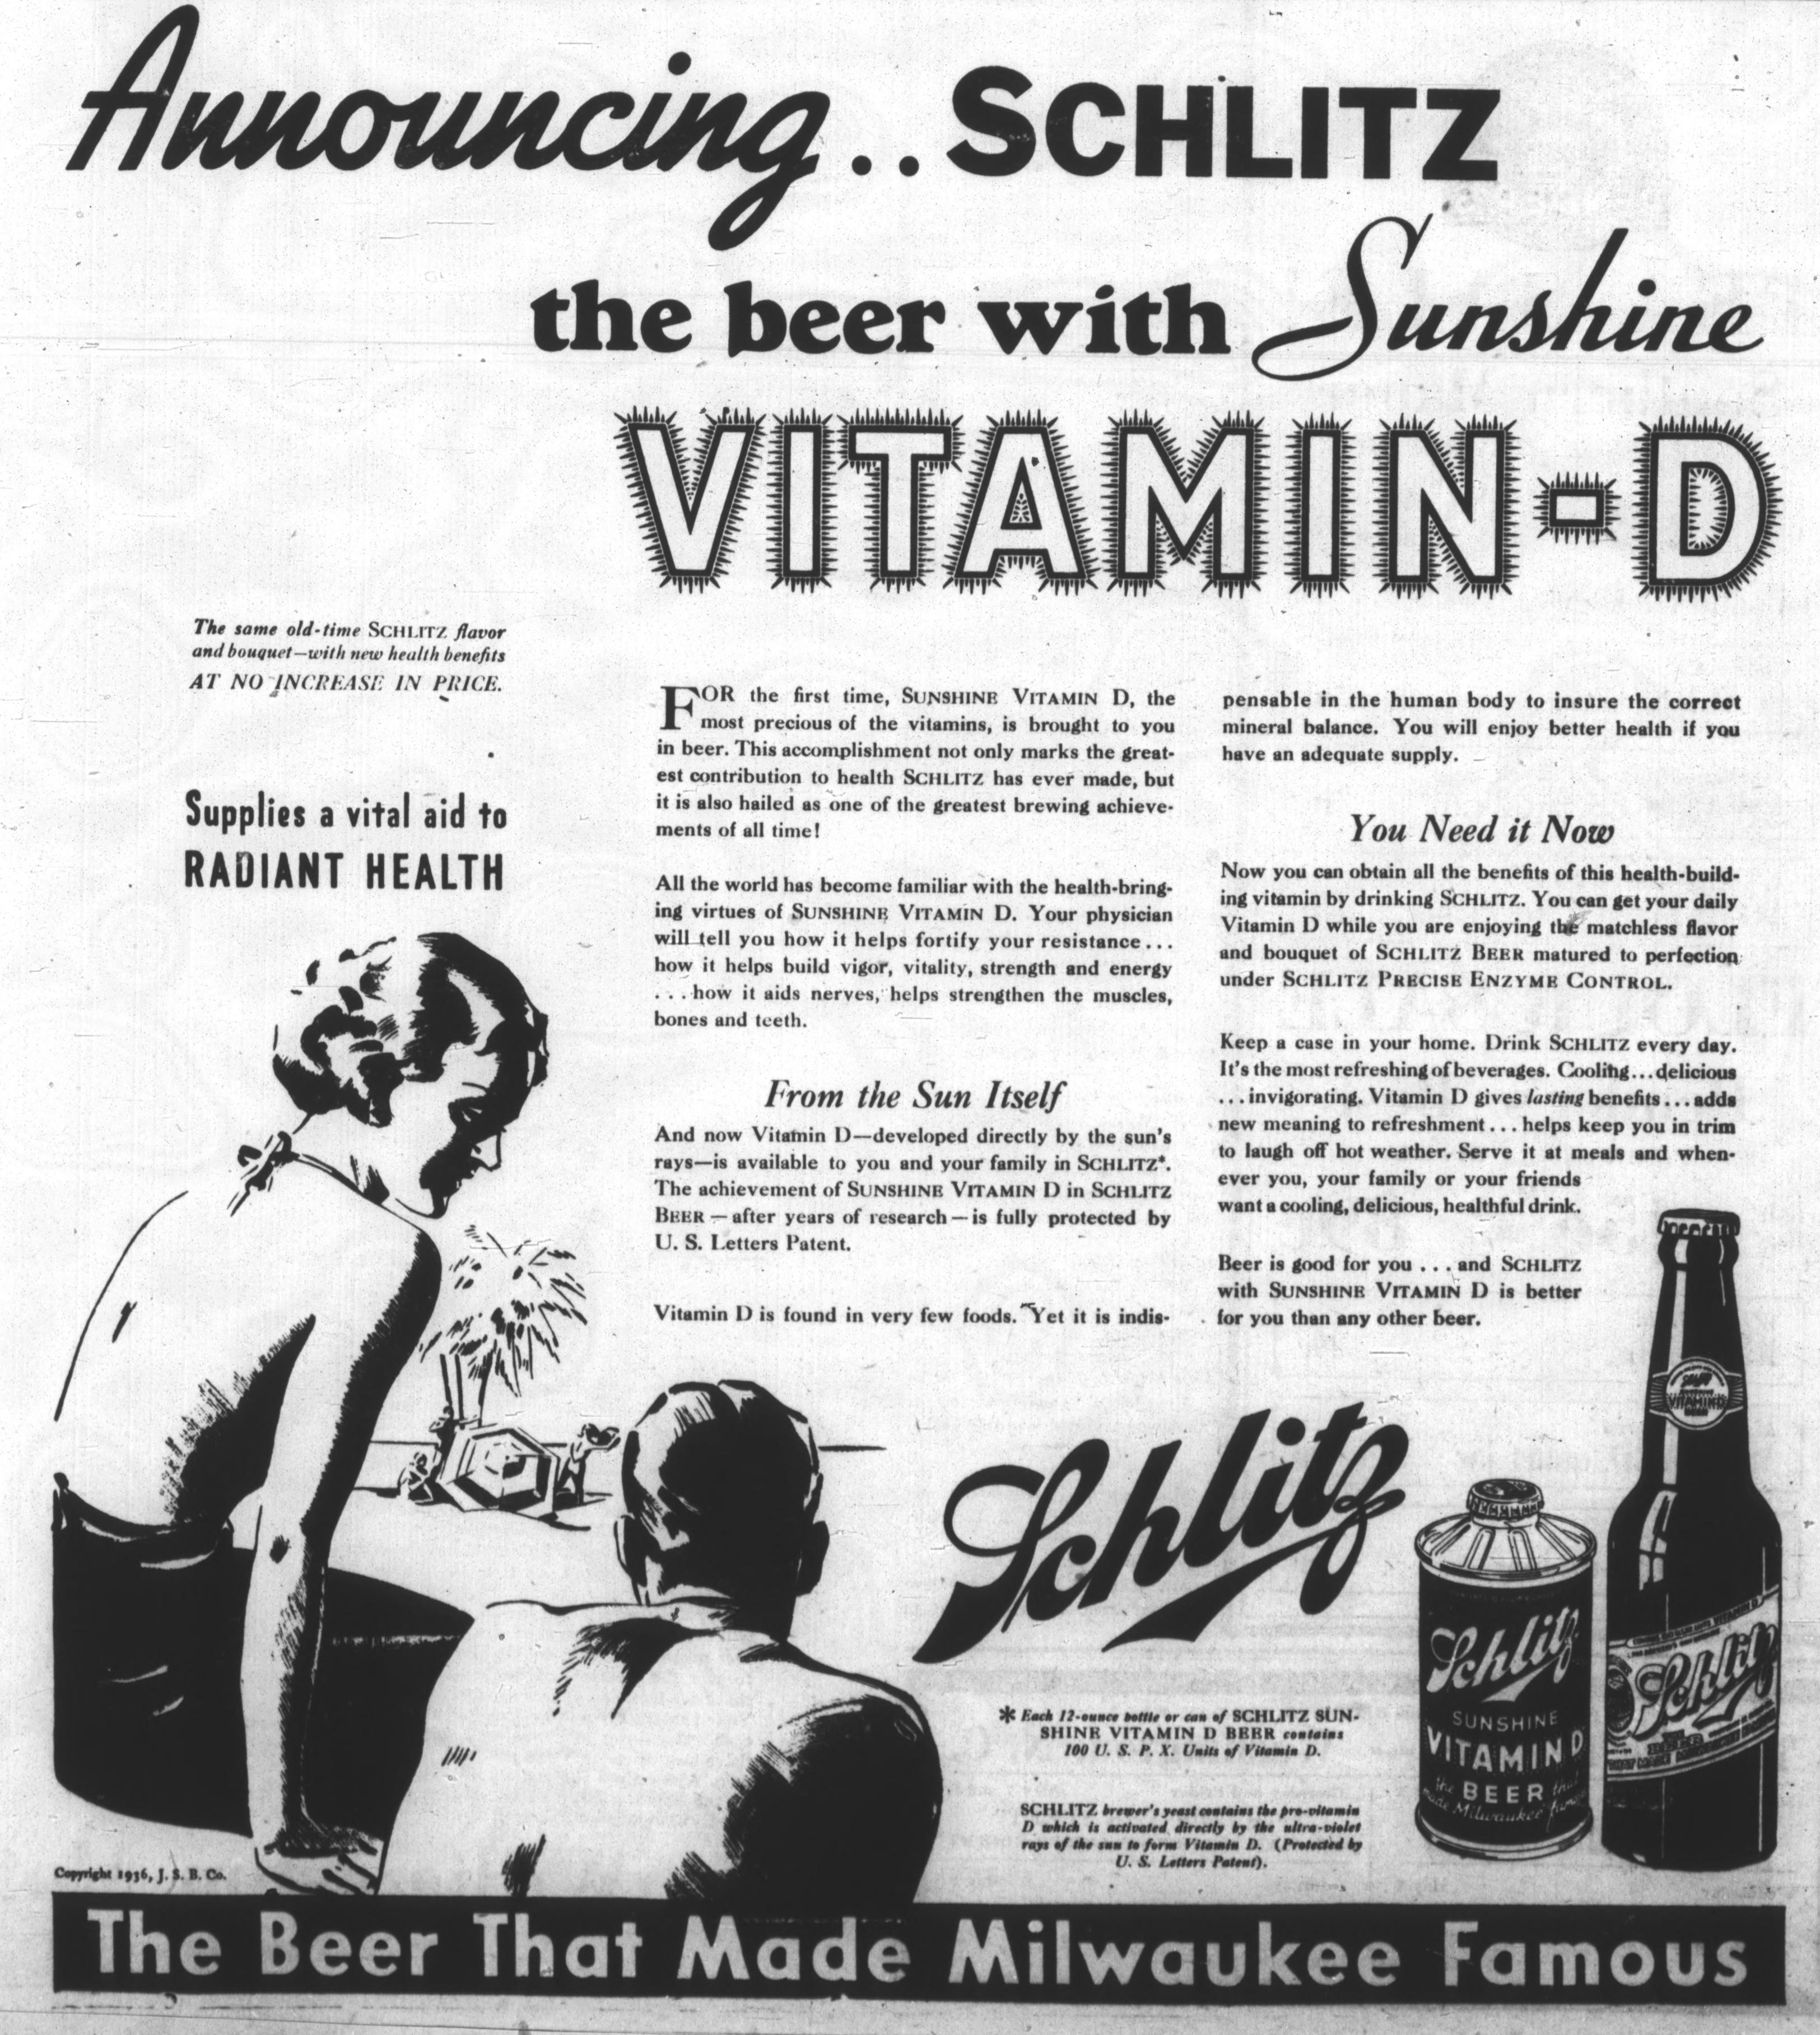 1936 ad for Schlitz beer